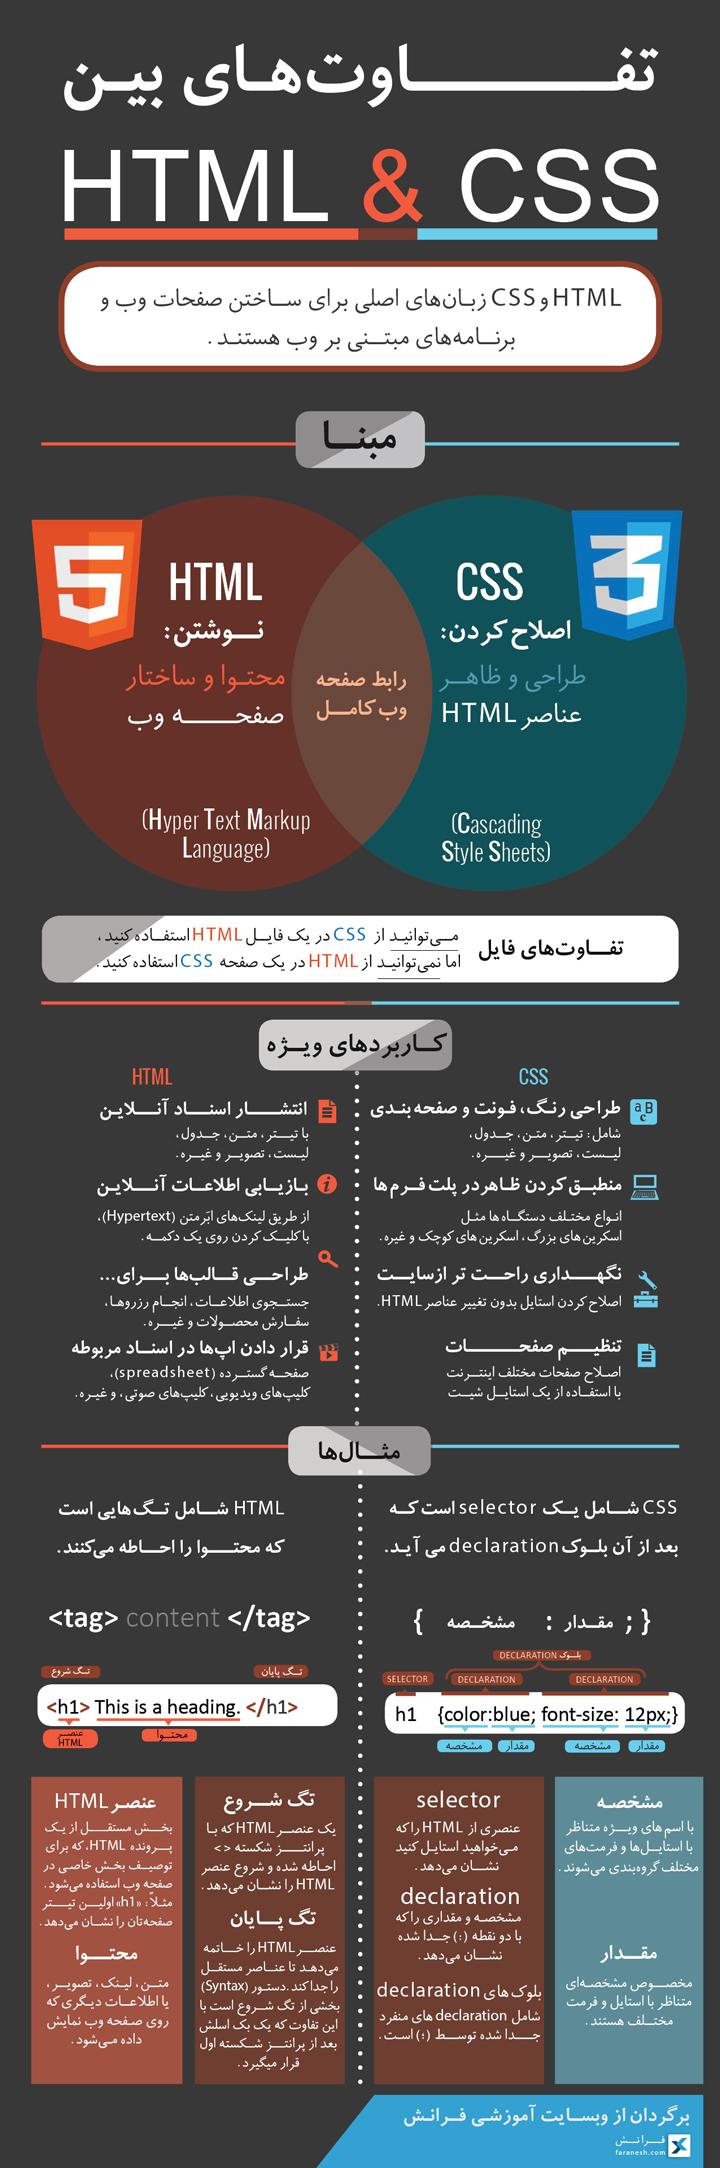 web-save-css-va-html